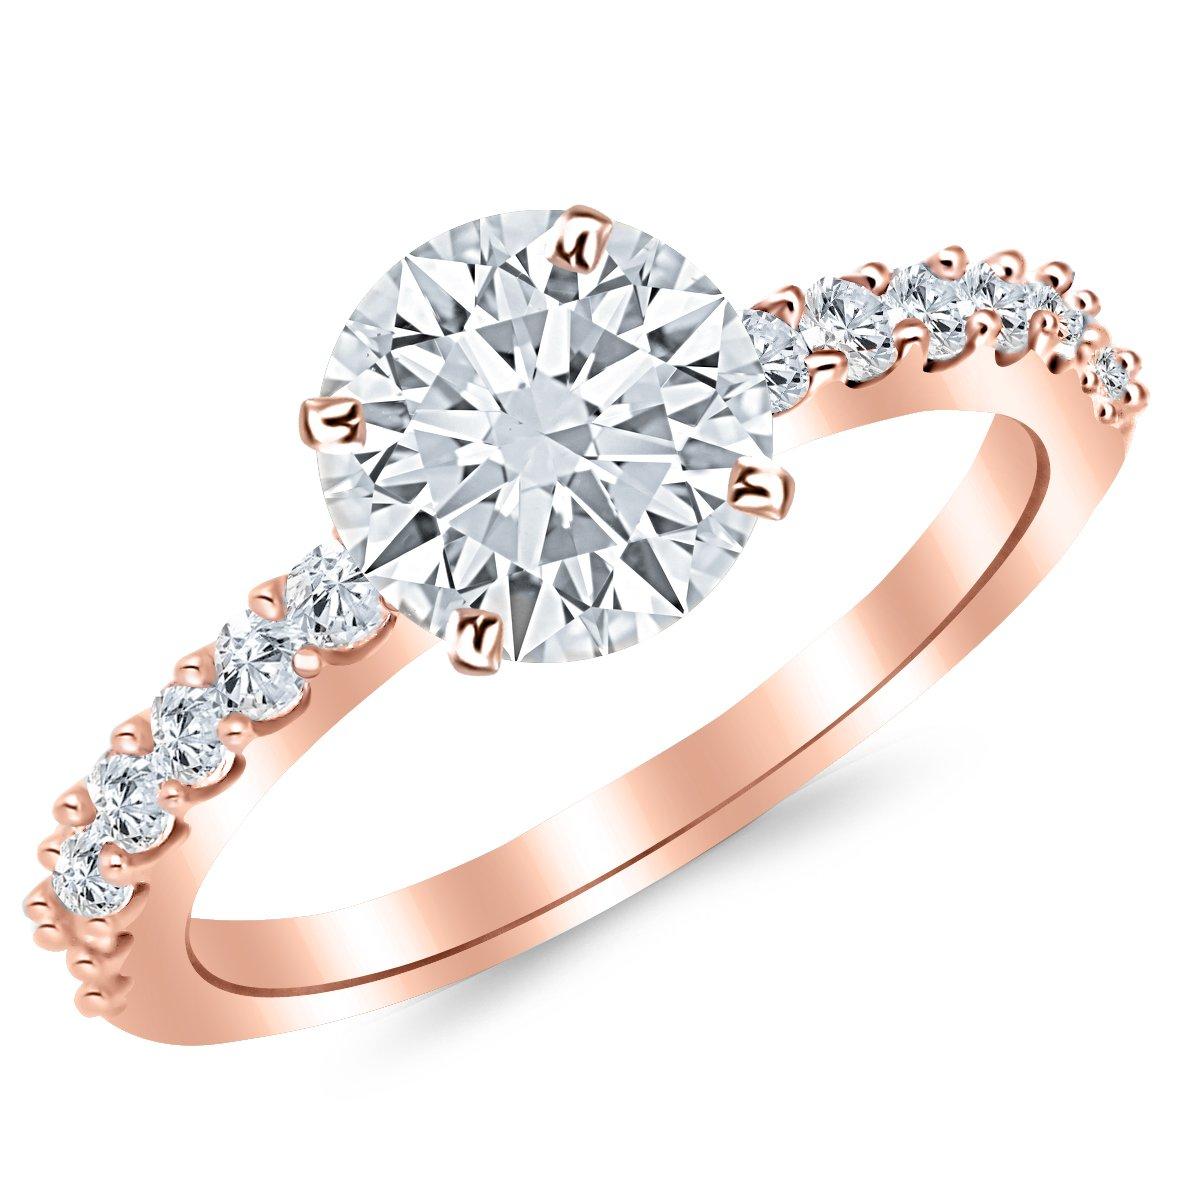 6900861b95da8 1.43 Carat 14K White Gold Classic Prong Set Diamond Engagement Ring with a  1 Carat JK I2 Center